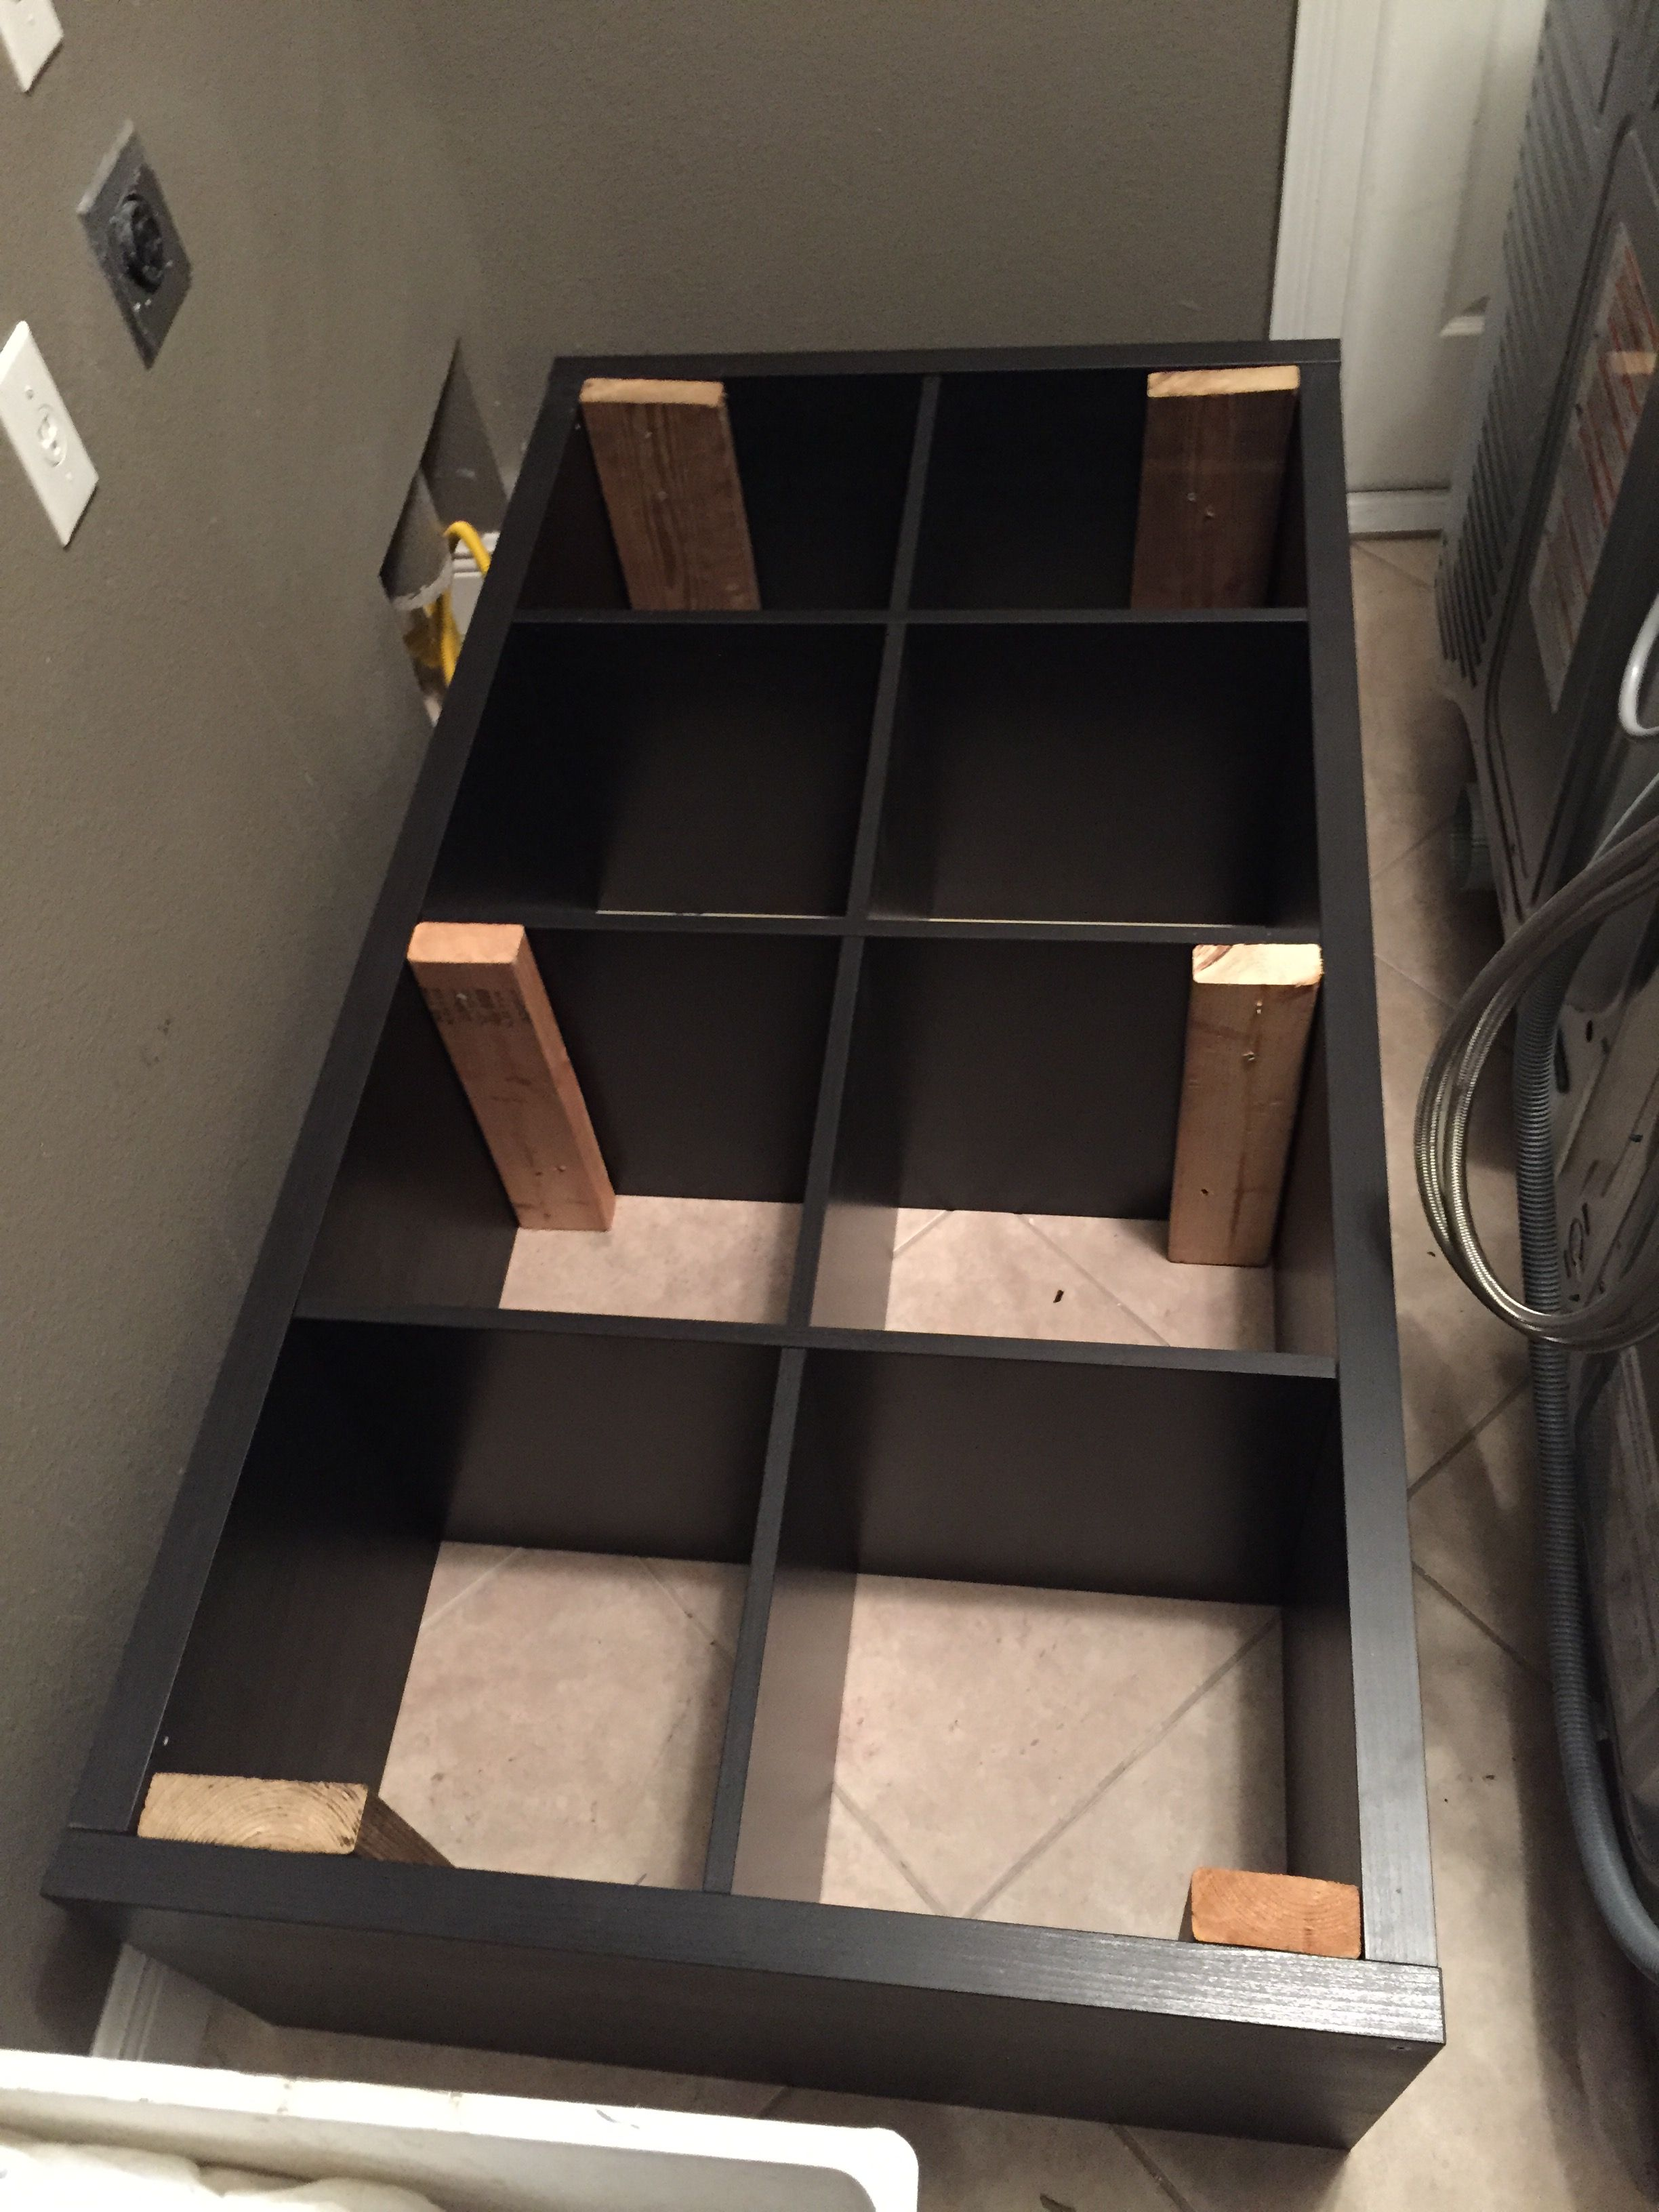 Converting An Ikea Kallax Book Shelf Into A Washer Dryer Pedestal Laundry Room Design Washer And Dryer Pedestal Kallax Ikea